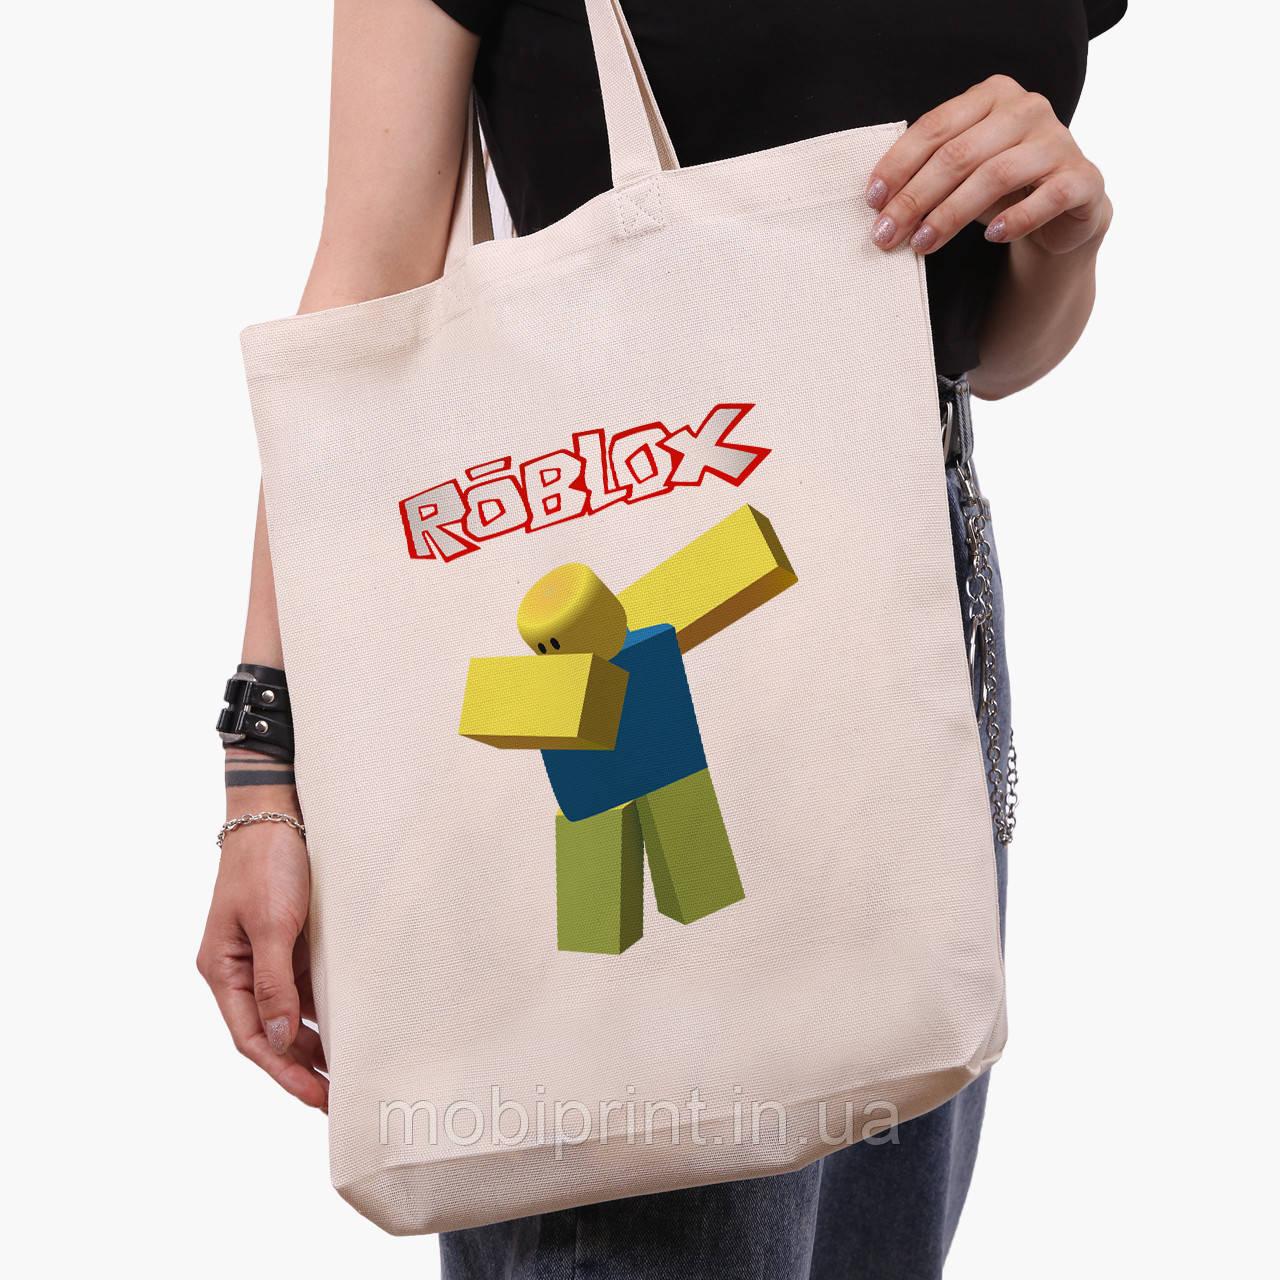 Еко сумка шоппер біла Роблокс (Roblox) (9227-1707-1) экосумка шопер 41*39*8 см